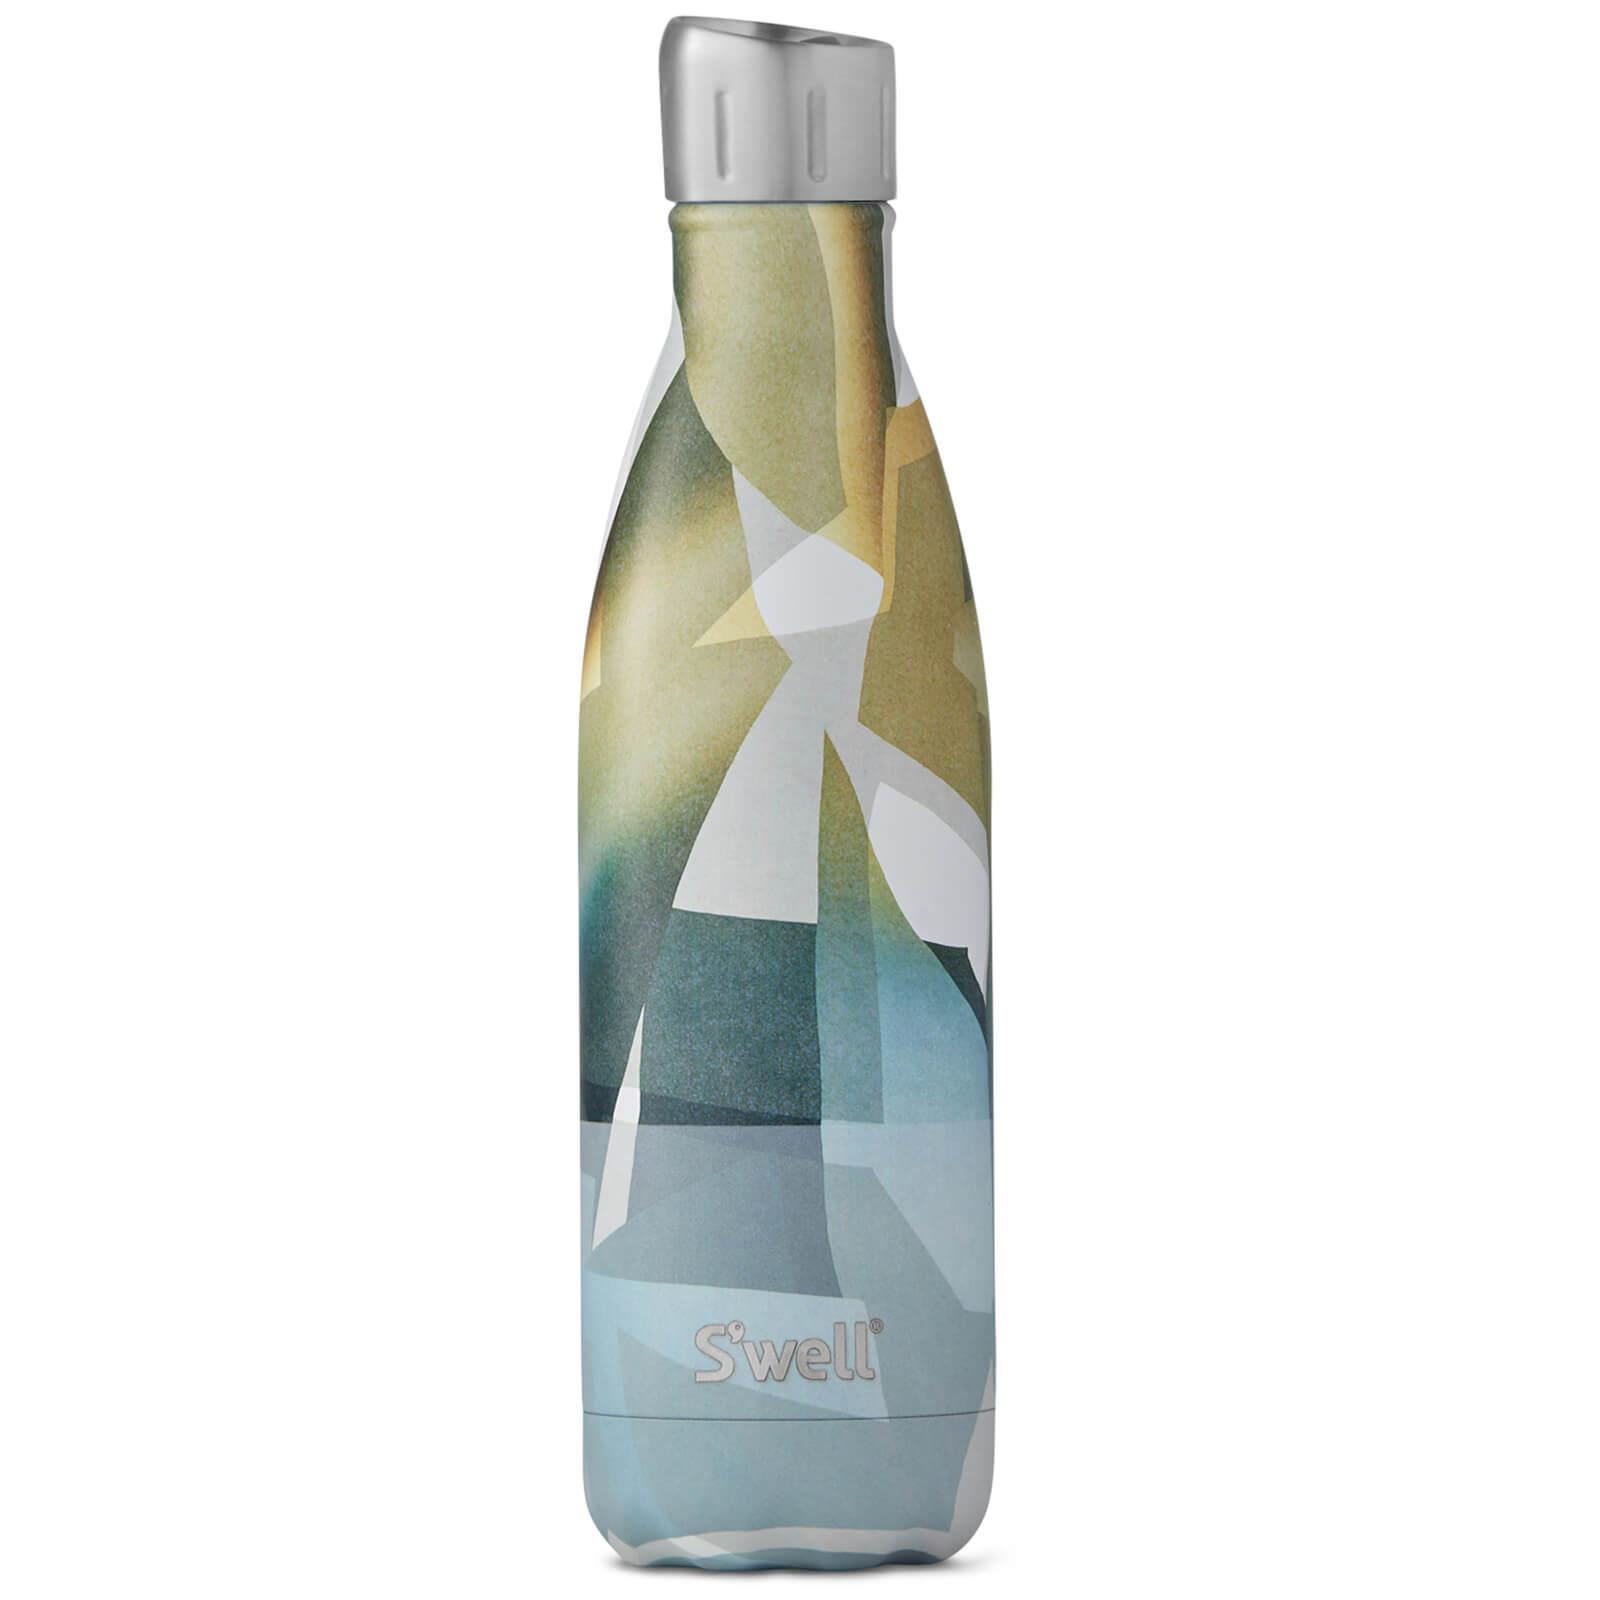 S'well Elan Water Bottle 500ml